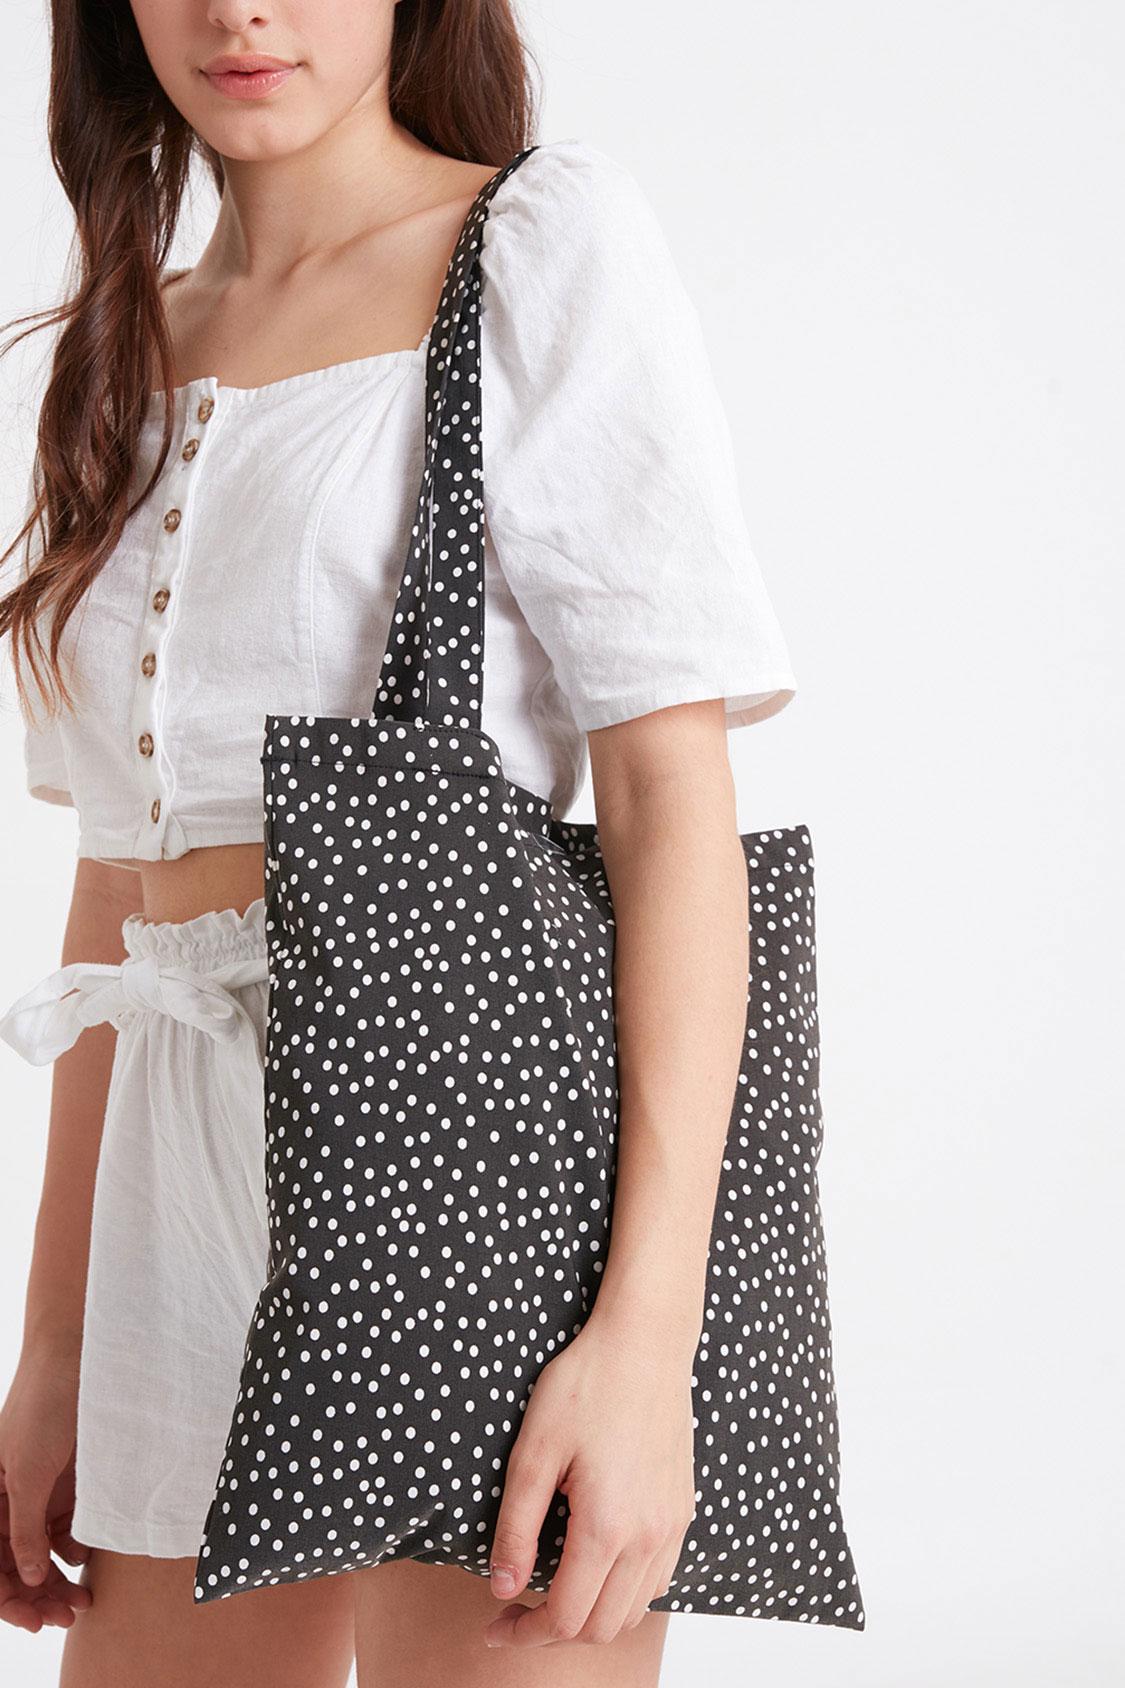 Shopping bag a pois